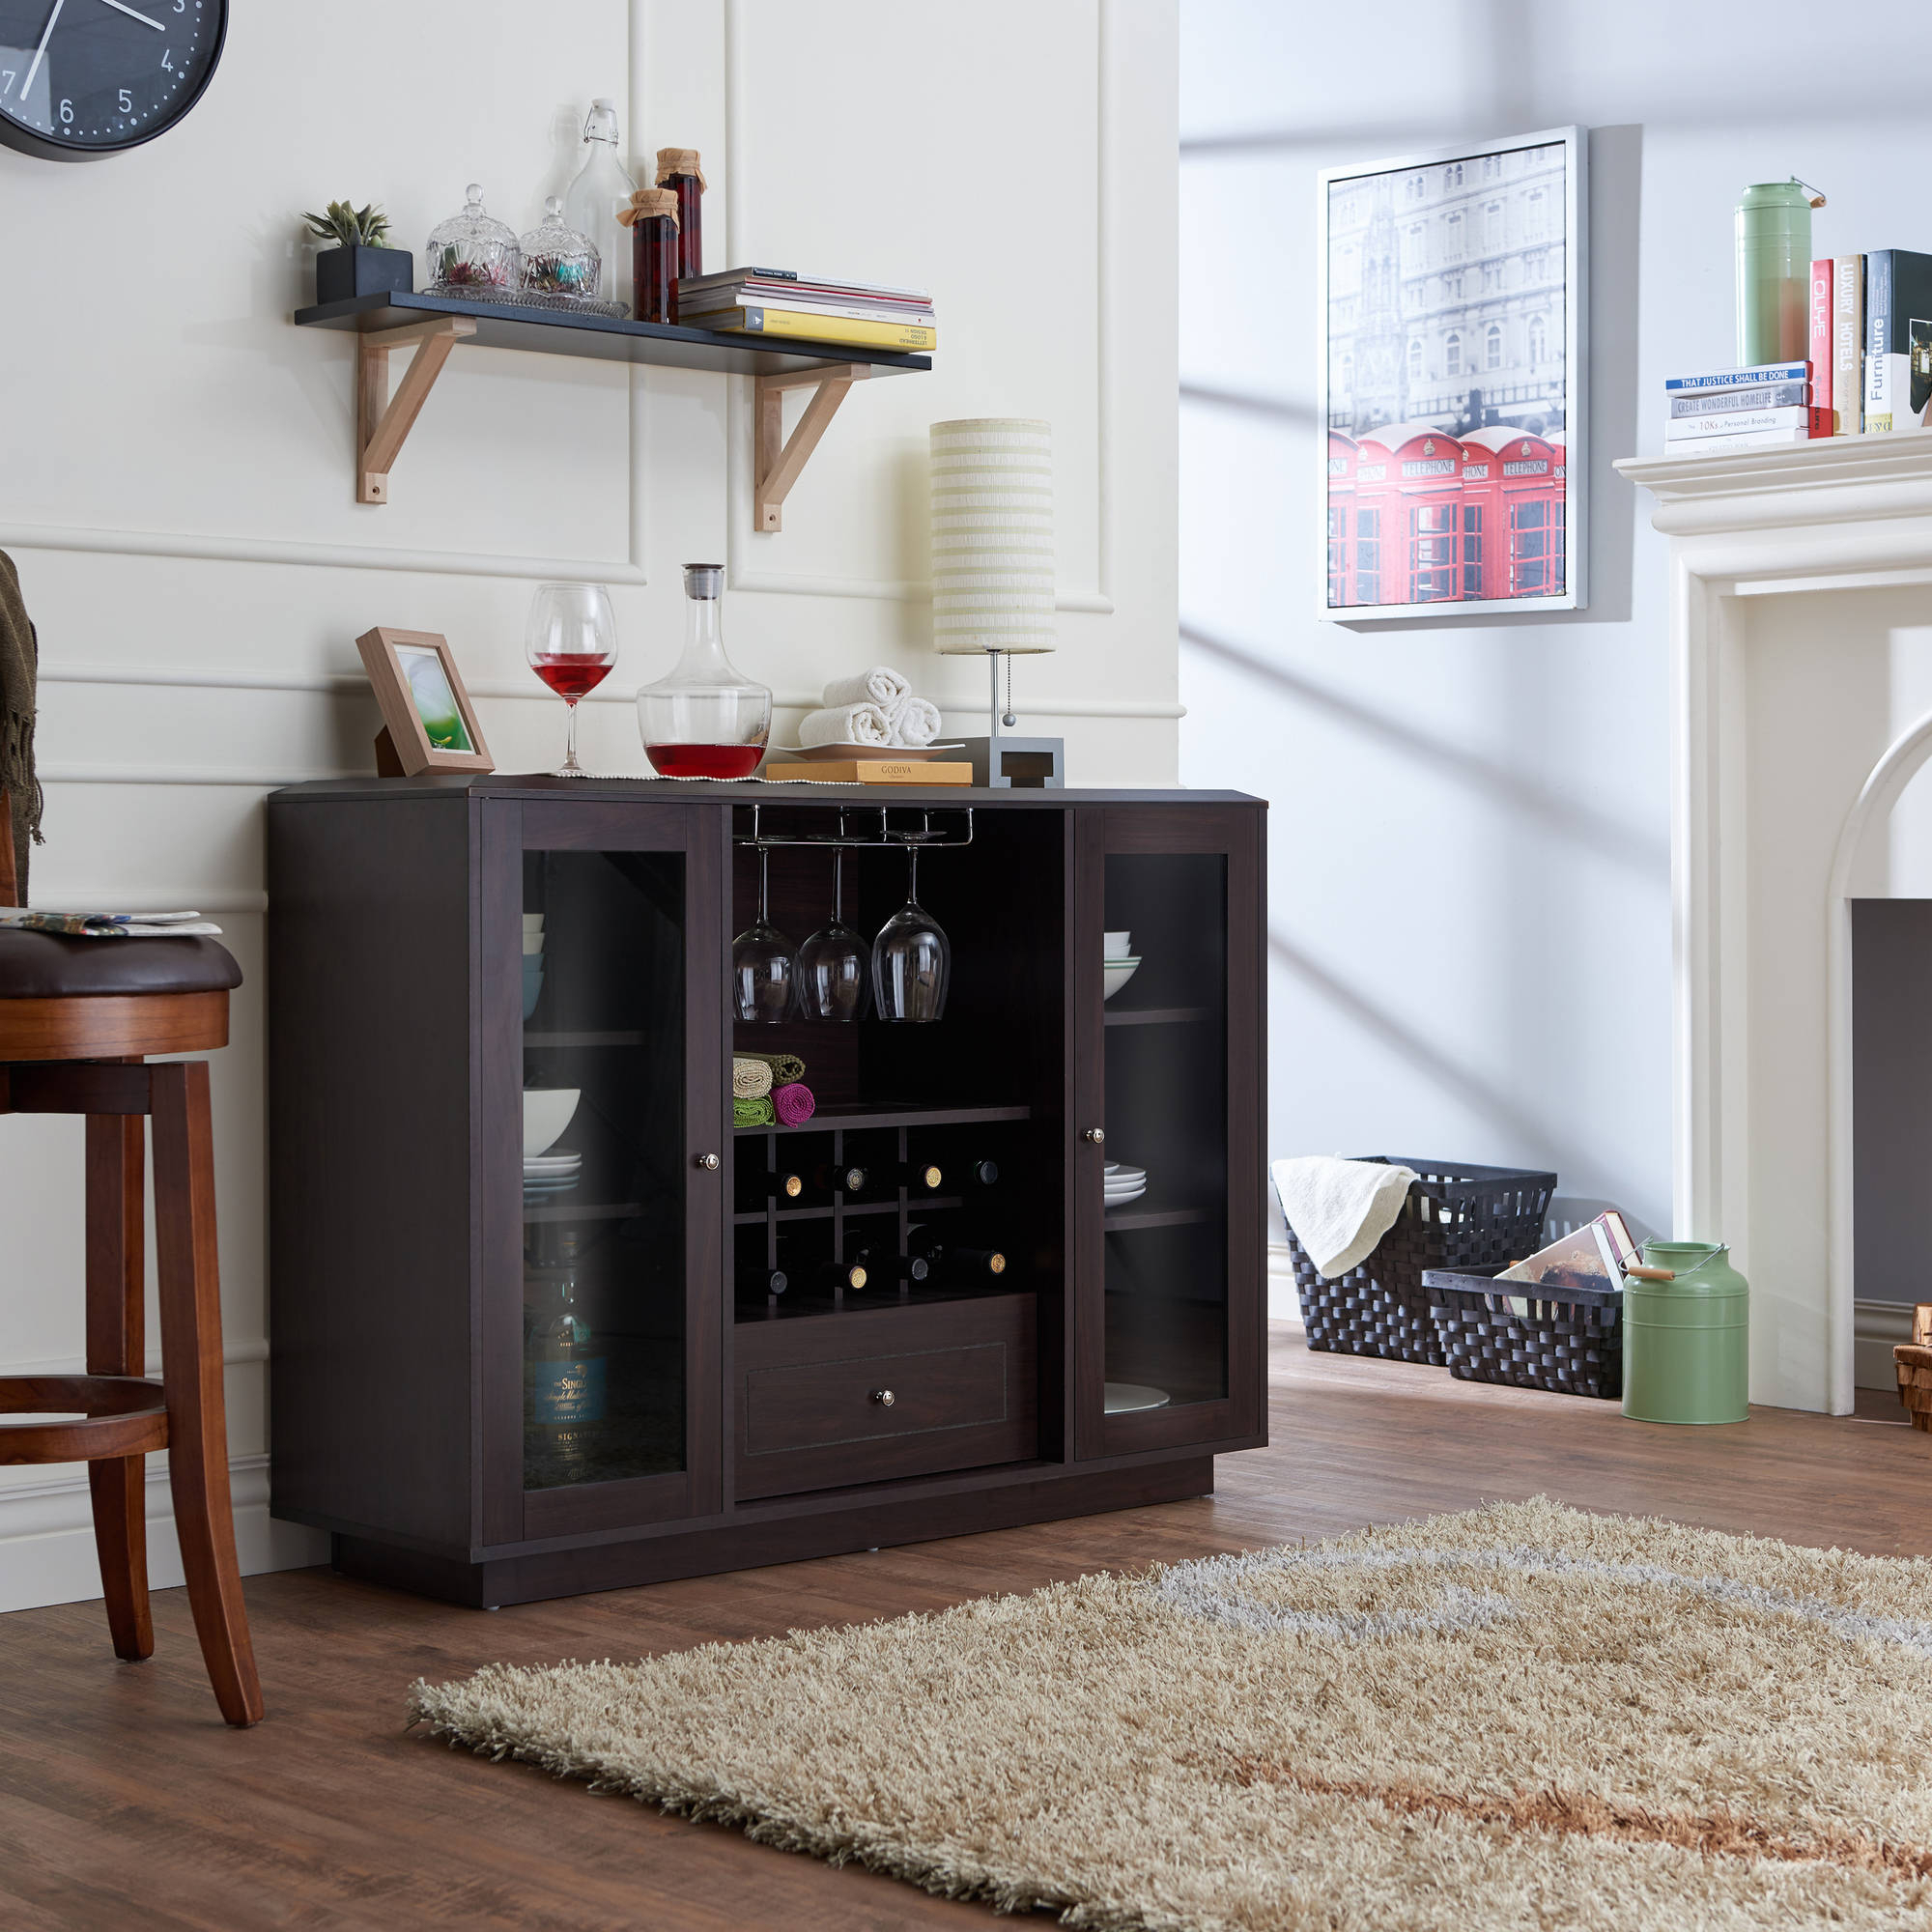 Furniture Of America Hegard Modern Multi Storage Dining Buffet, Espresso Regarding Contemporary Espresso 2 Cabinet Dining Buffets (View 10 of 30)